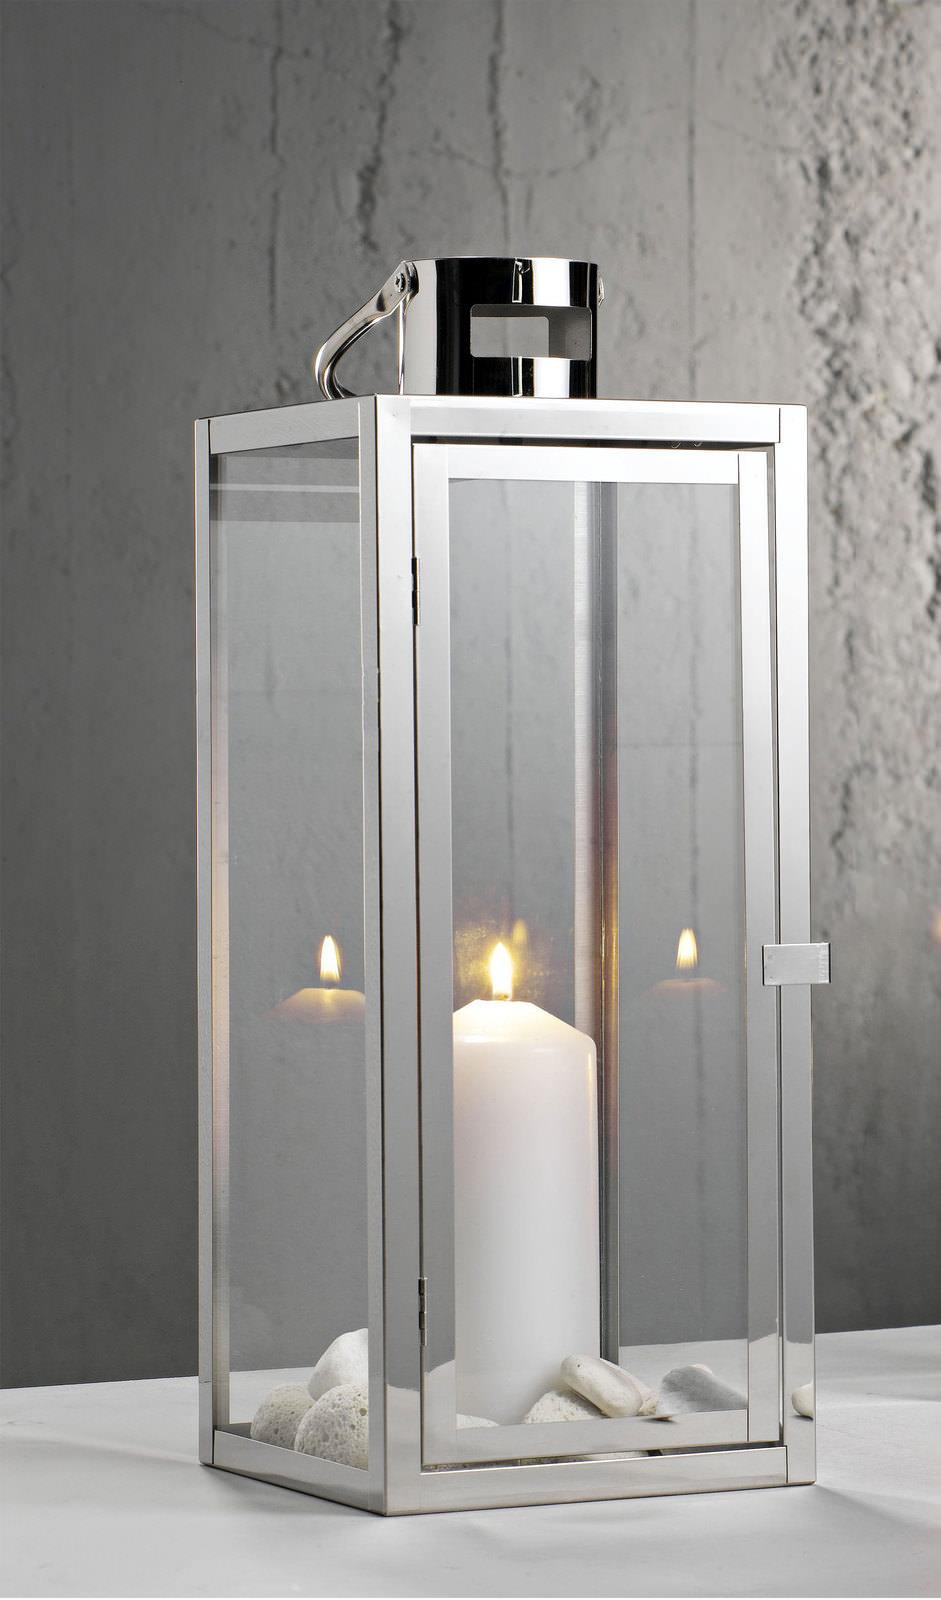 casa nova deko laterne online entdecken schaffrath. Black Bedroom Furniture Sets. Home Design Ideas